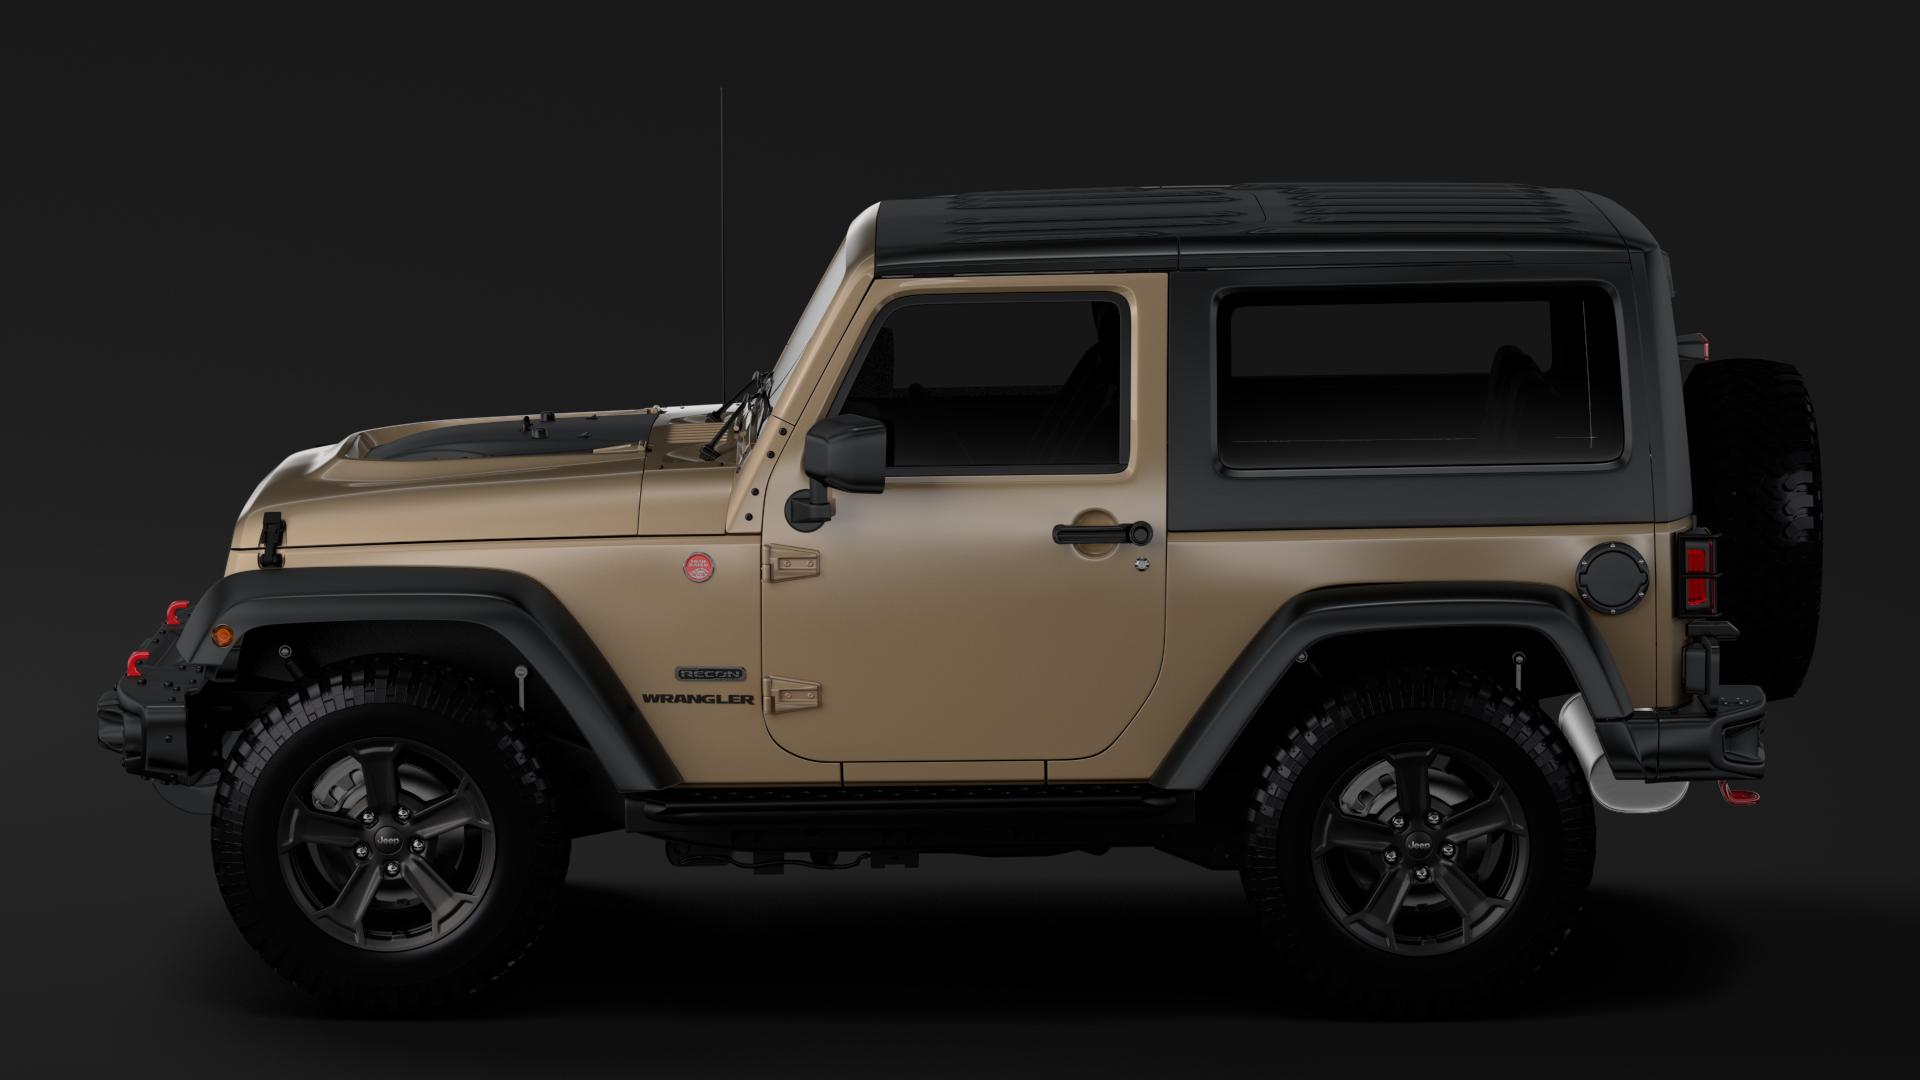 jeep wrangler rubicon recon jk 2017 3d model max fbx lwo ma mb hrc xsi obj 276949